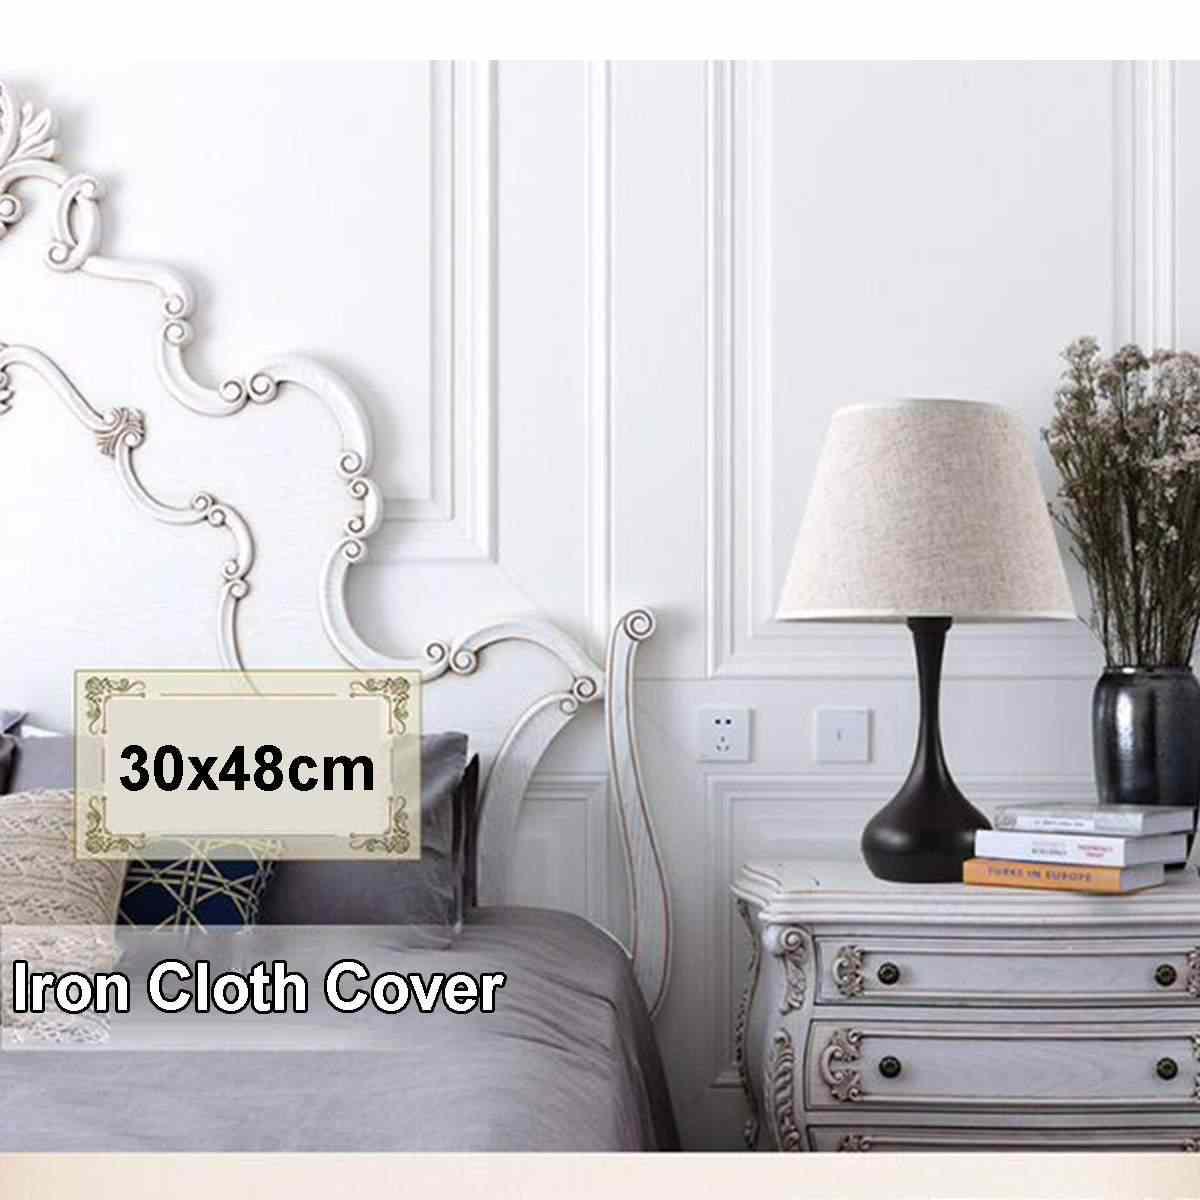 LED שולחן מנורת מיטת הבית מודרנית מיטת מנורת שולחן שינה סלון תאורה חם לבן תאורת לילה אור דקור